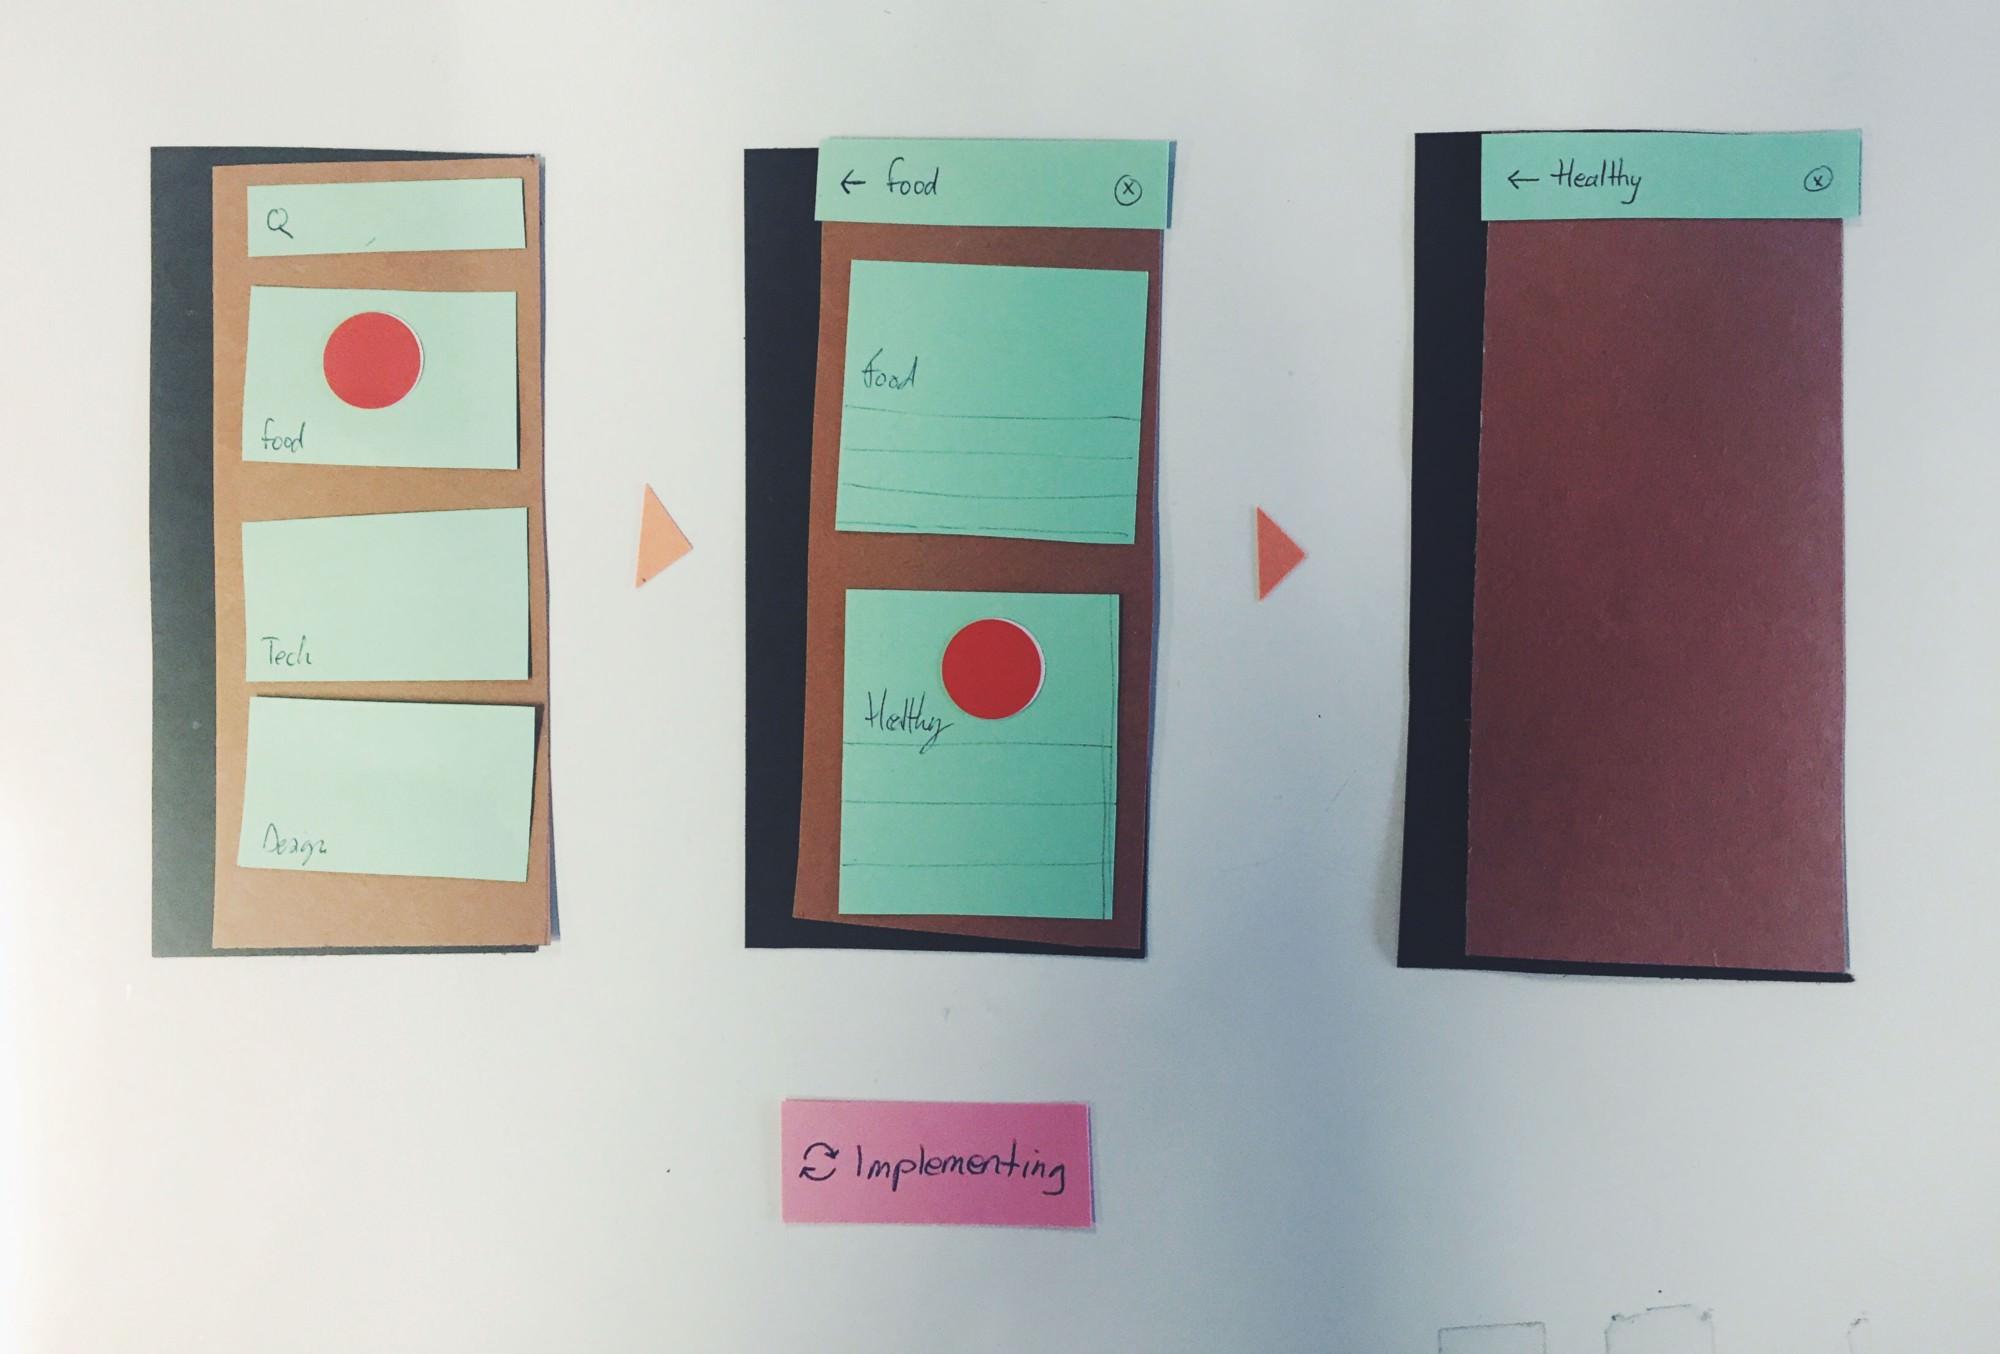 implementation-material-design-image1